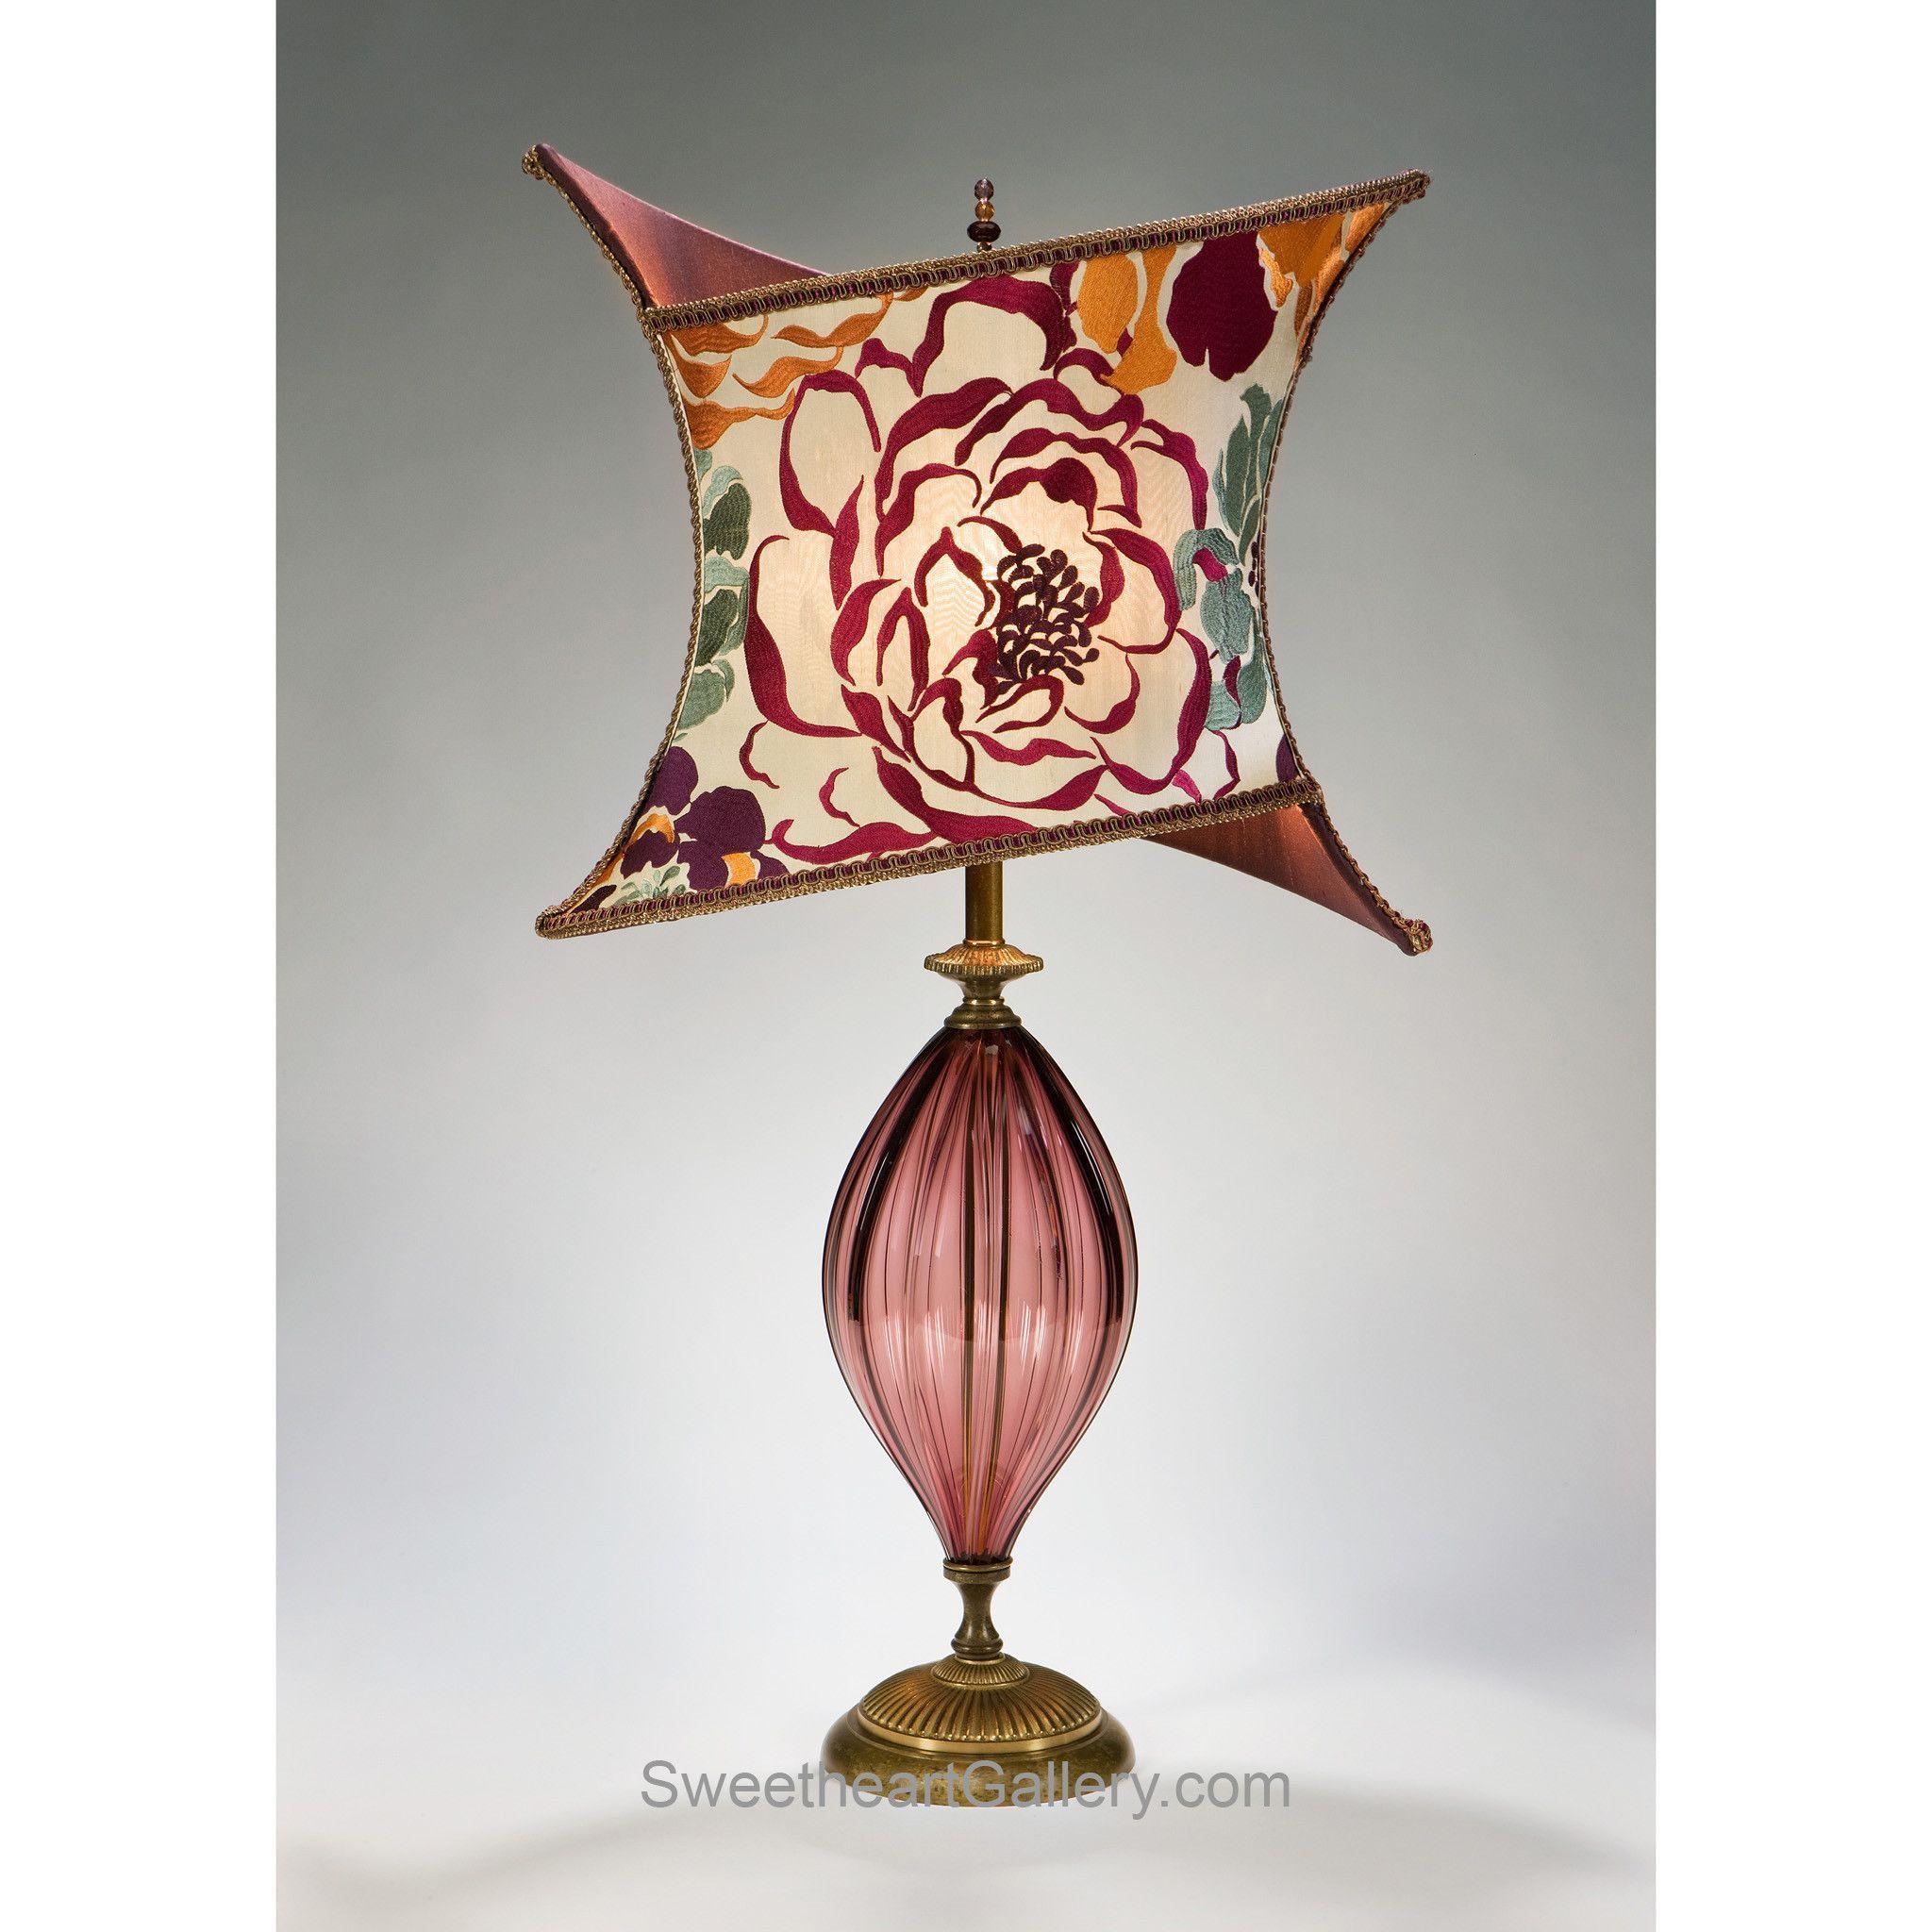 Tori Table Lamp 61y67 by Kinzig Design, Colors Purple, Fuchsia, Salmon, Sea Foam Green, Blown Glass, Artistic Artisan Designer Table Lamps